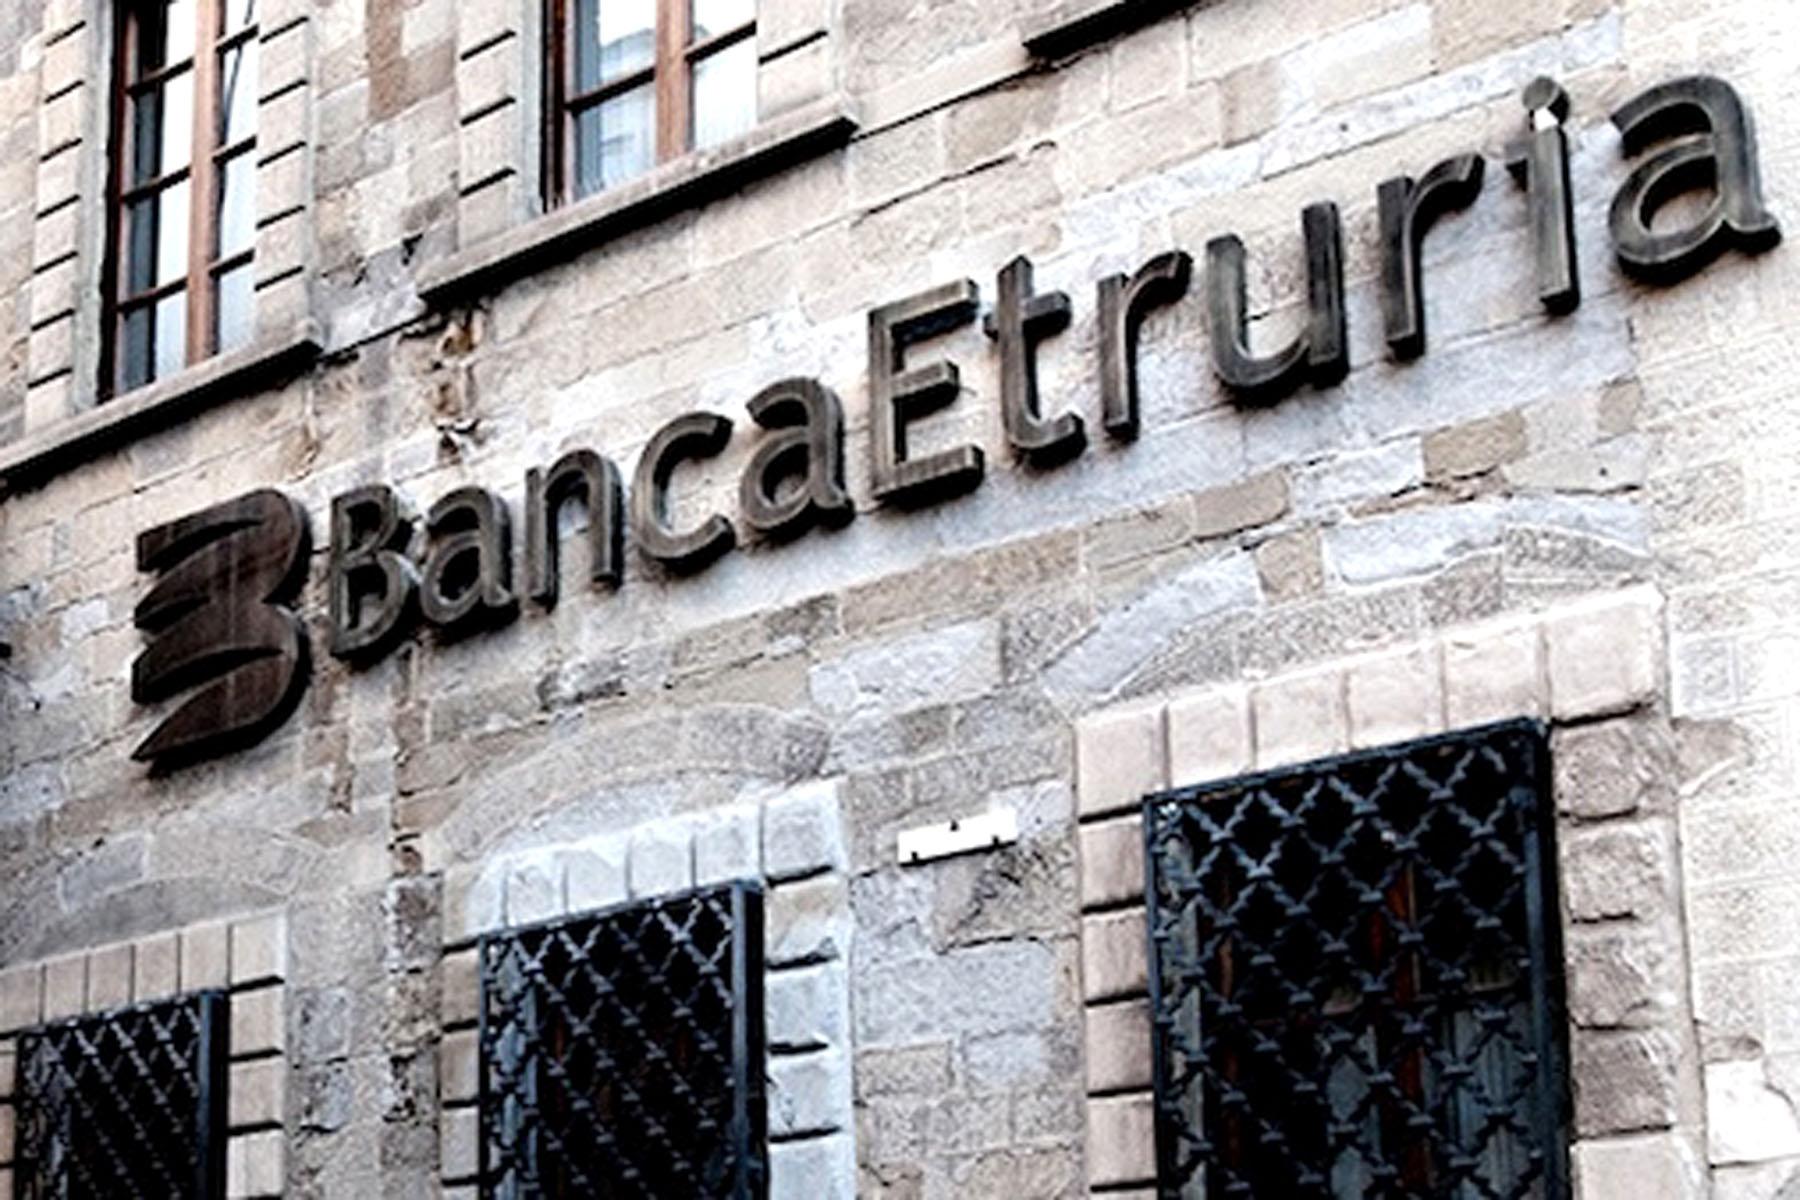 Banca Etruria, ostacolo vigilanza: i tre imputati assolti